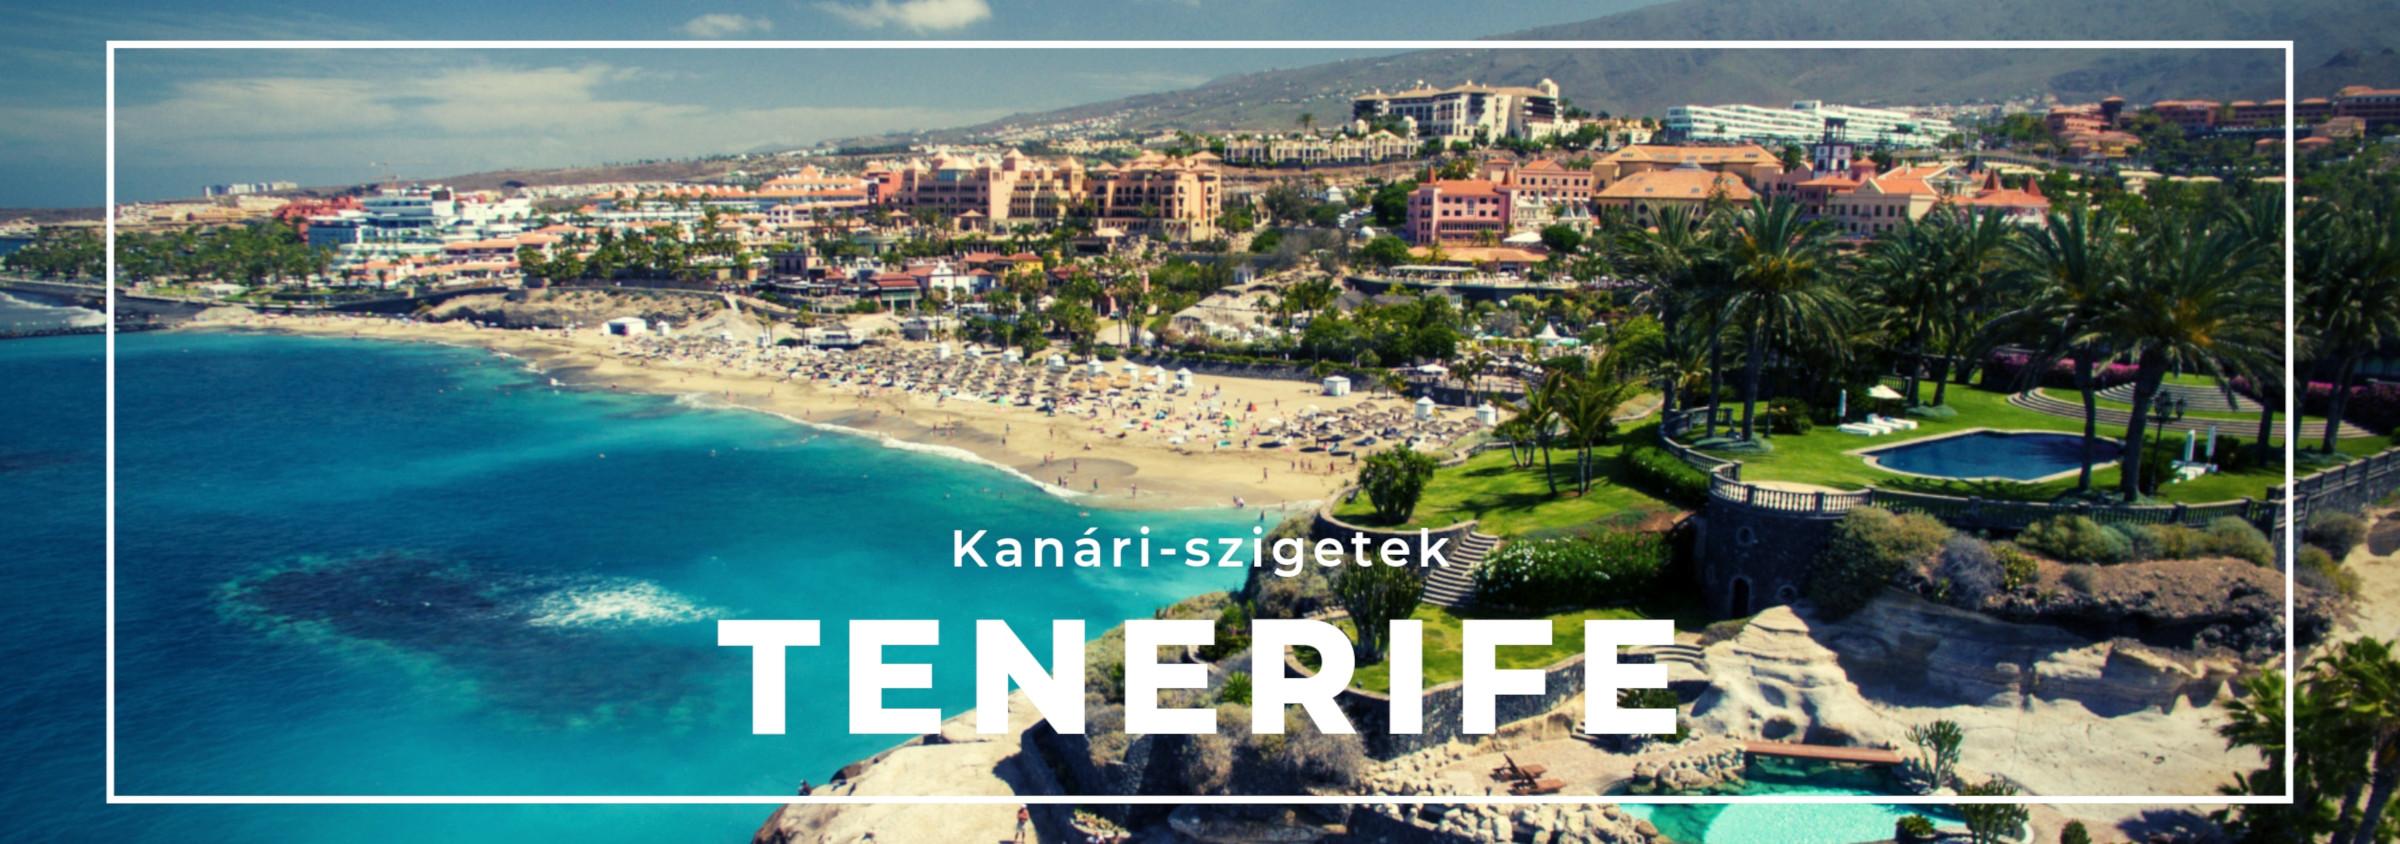 KANARI-SZIGETEK-TENERIFE-UTAZAS